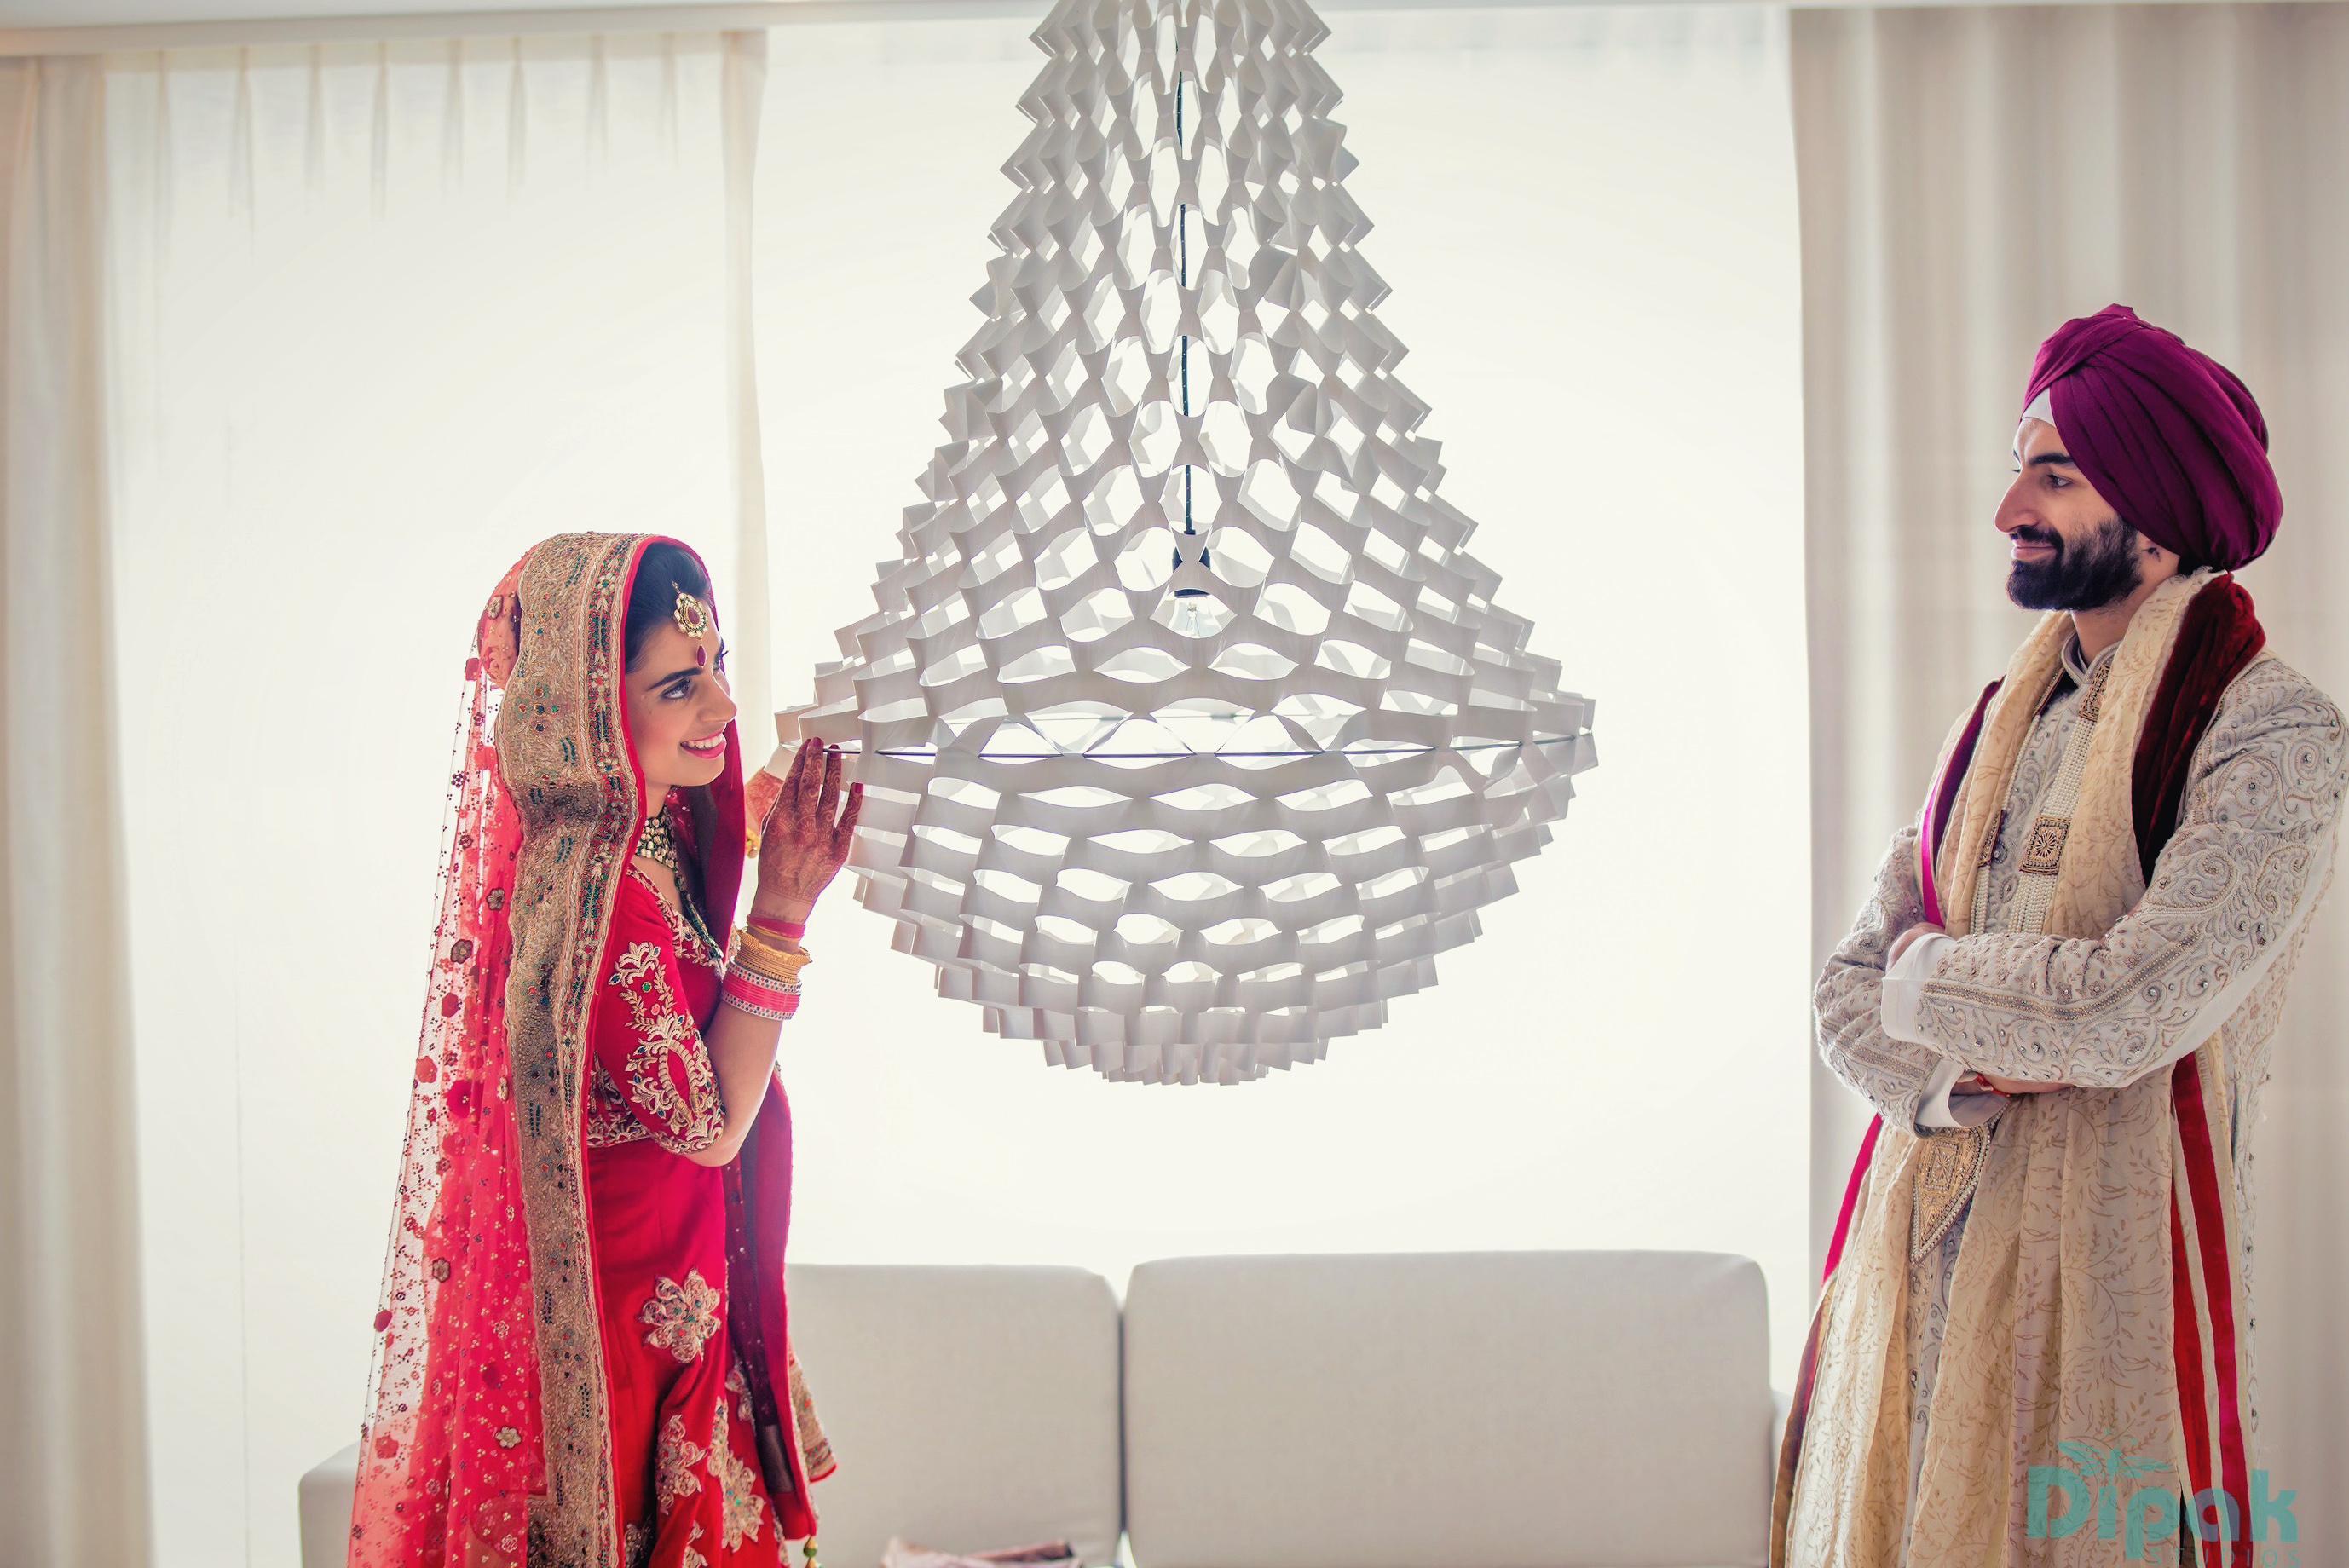 Ankita & Manmeet Fairytale Wedding in Amsterdam - The Maharani Diaries